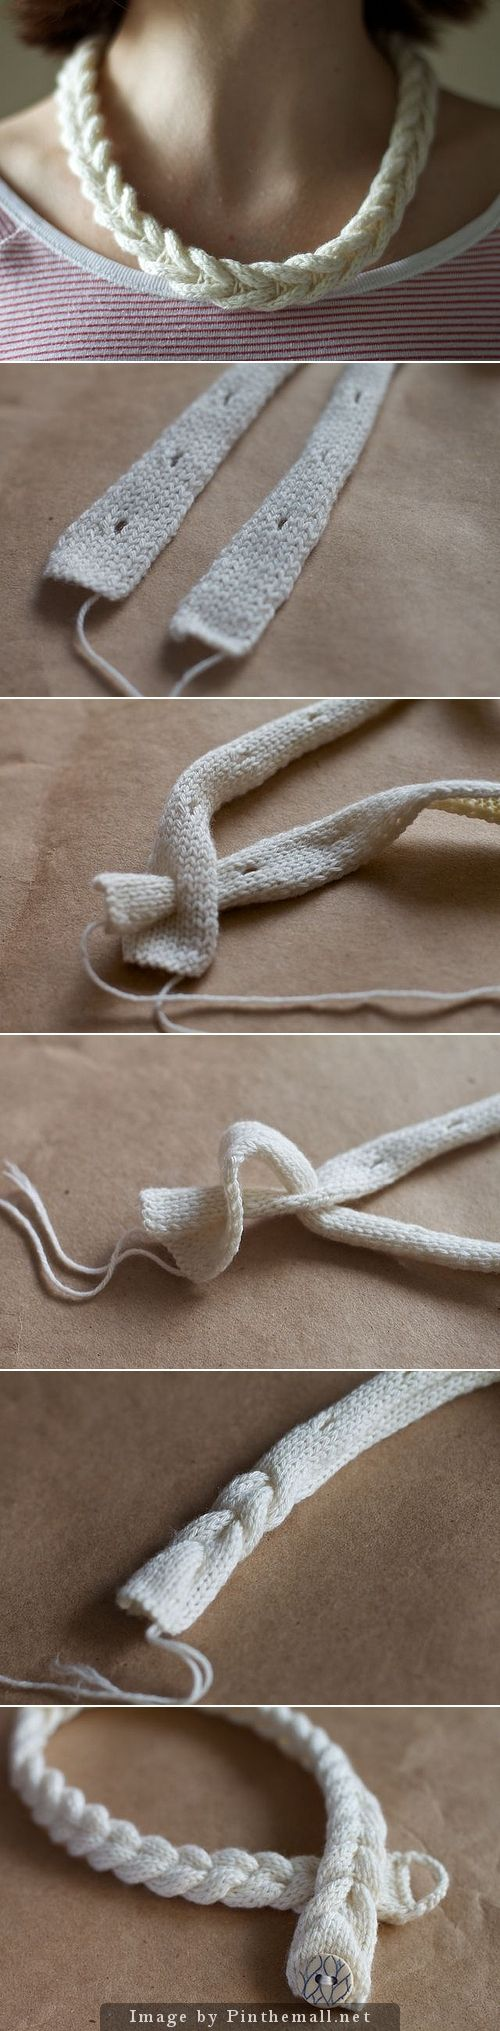 Knitting_Tutorial - \